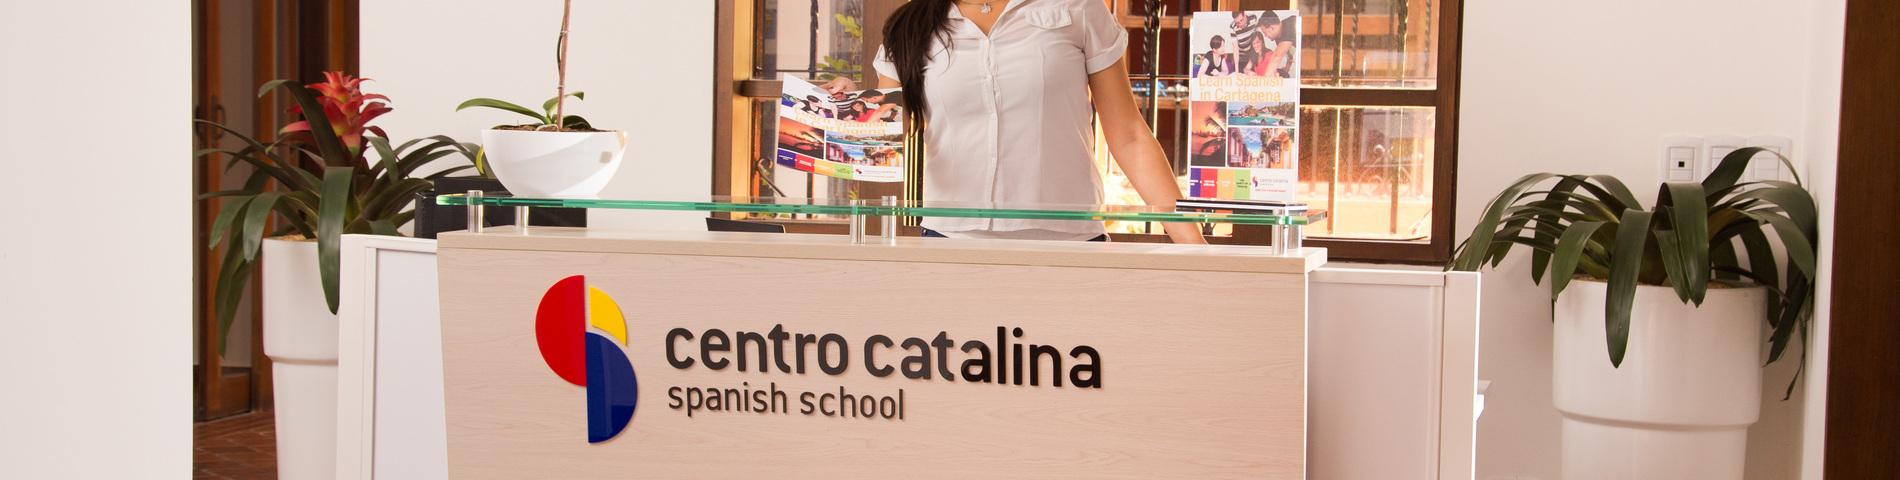 Centro Catalina foto 1